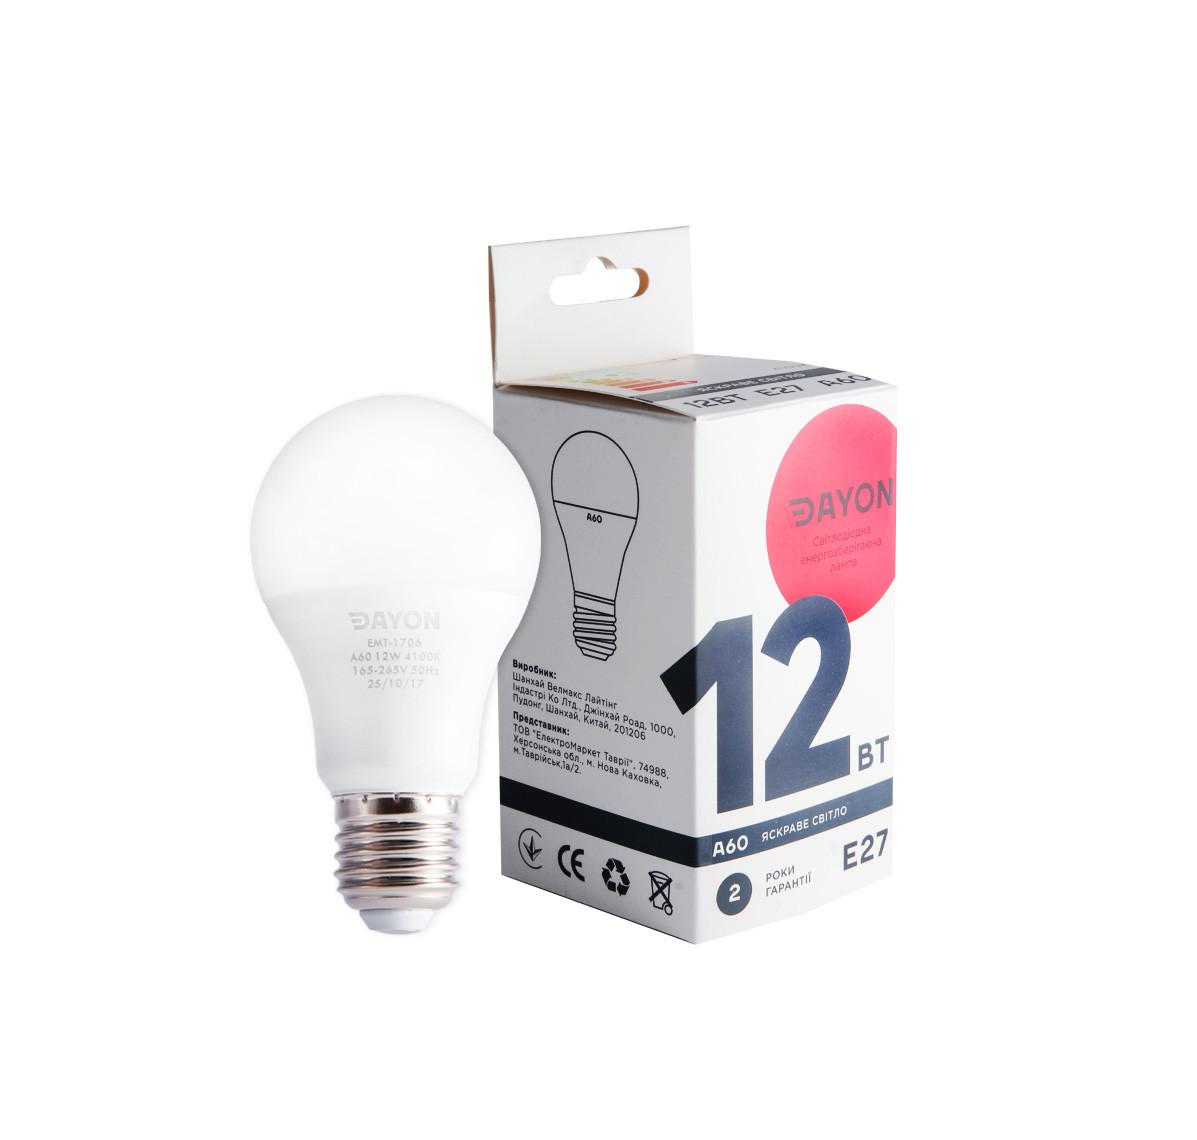 Светодиодная лампа DAYON EMT-1706 A60 12W 4100K E27